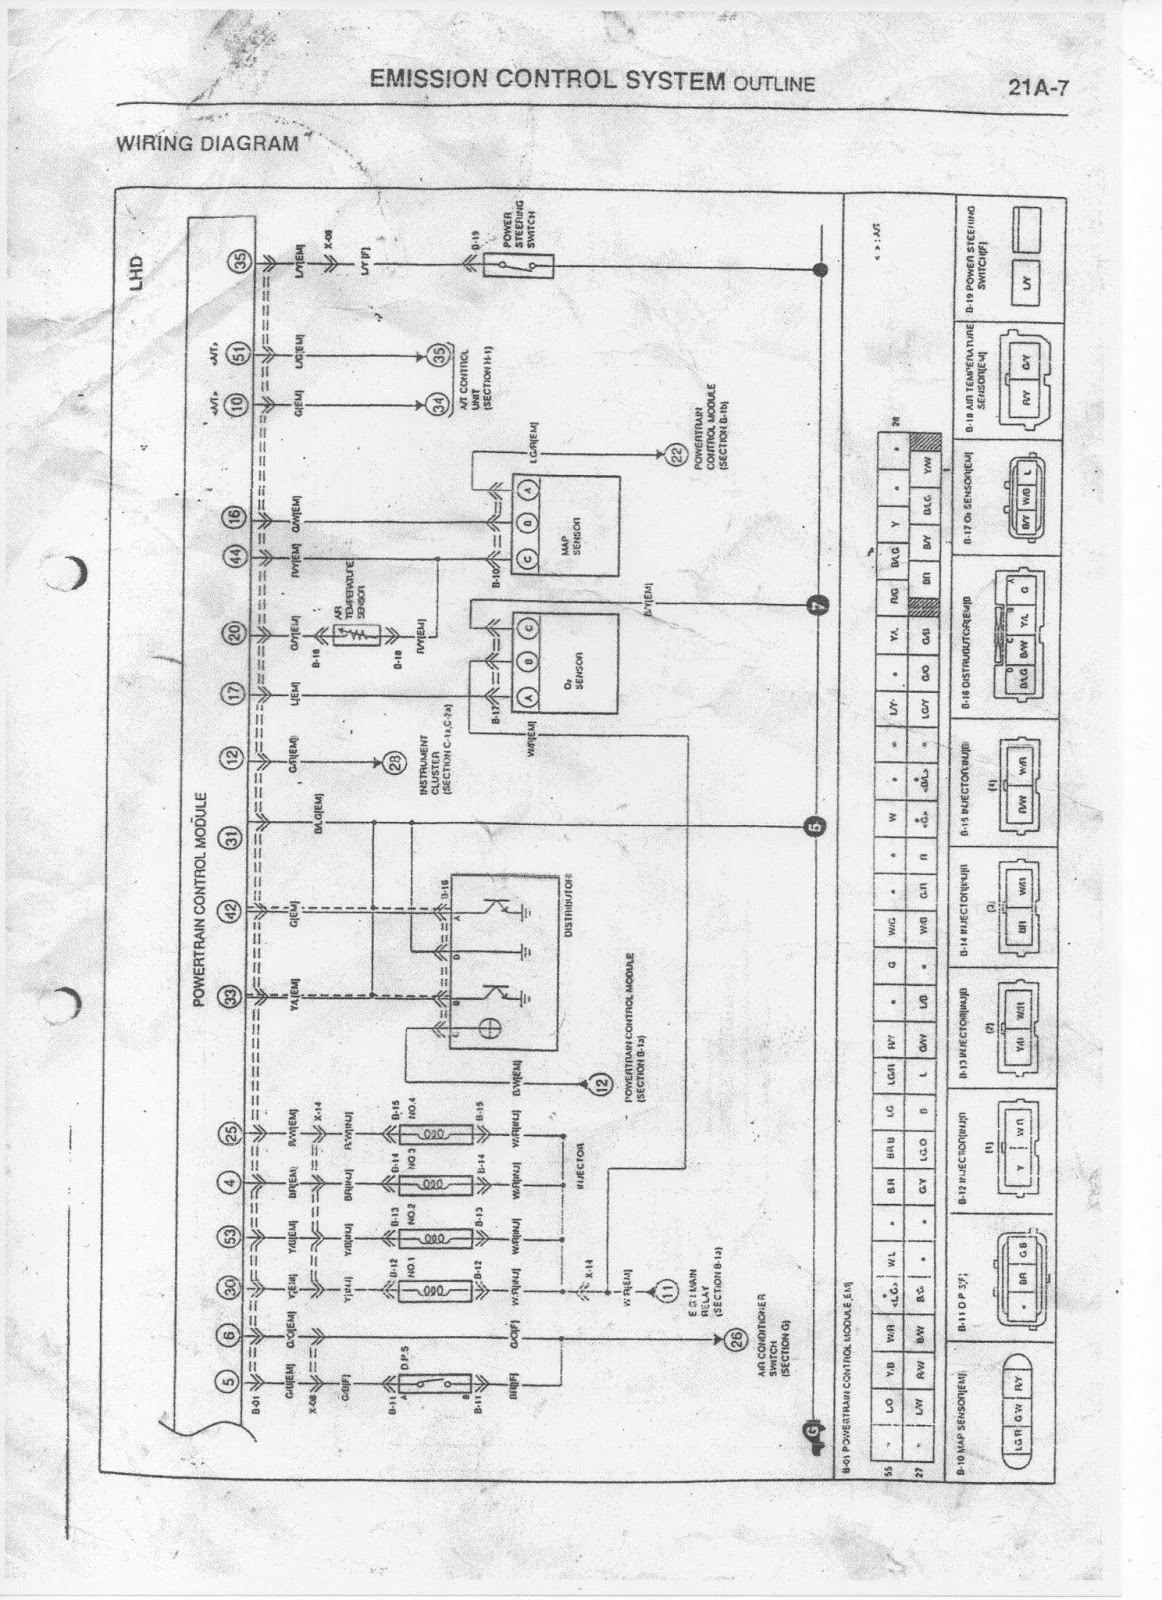 medium resolution of wiring diagram kia sephia master mobil efiwiring diagram kia sephia